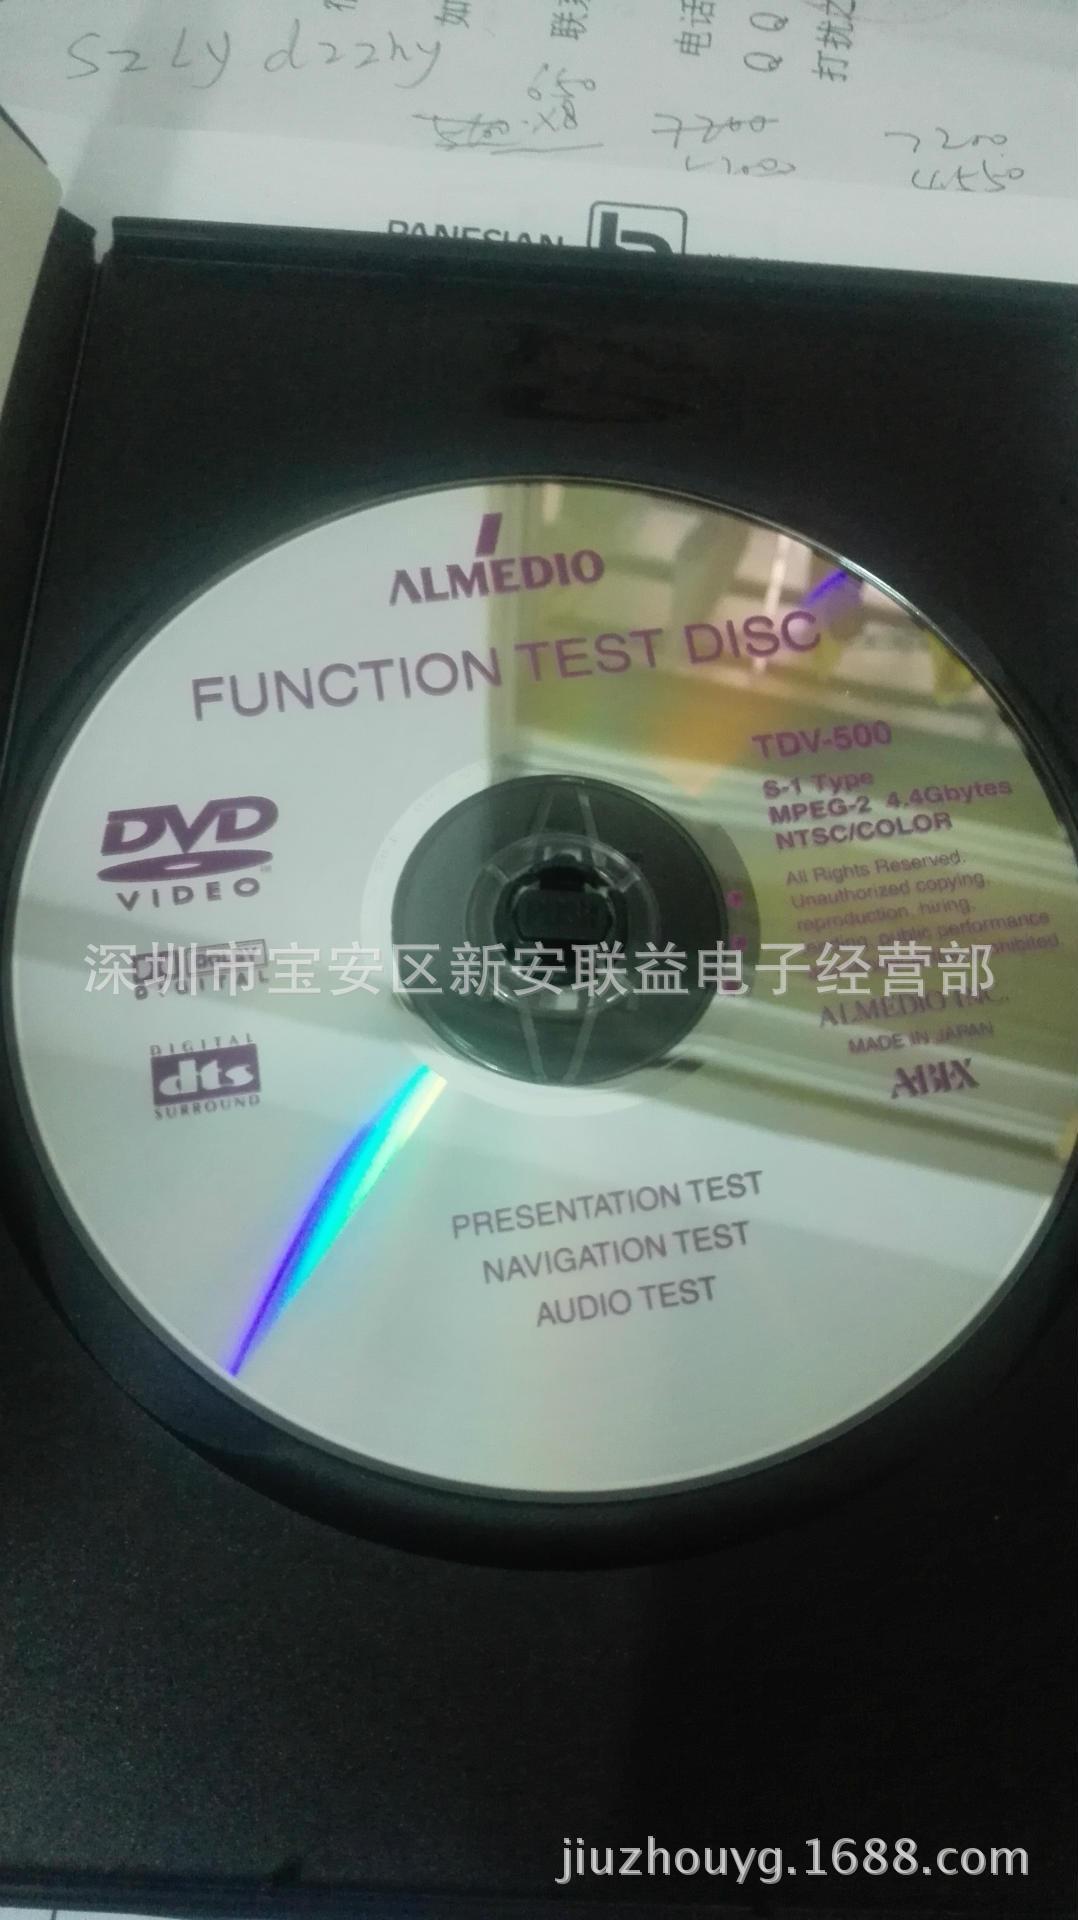 供应三洋测试碟 GHB-82ES100 玻璃测试碟 激光头调整碟